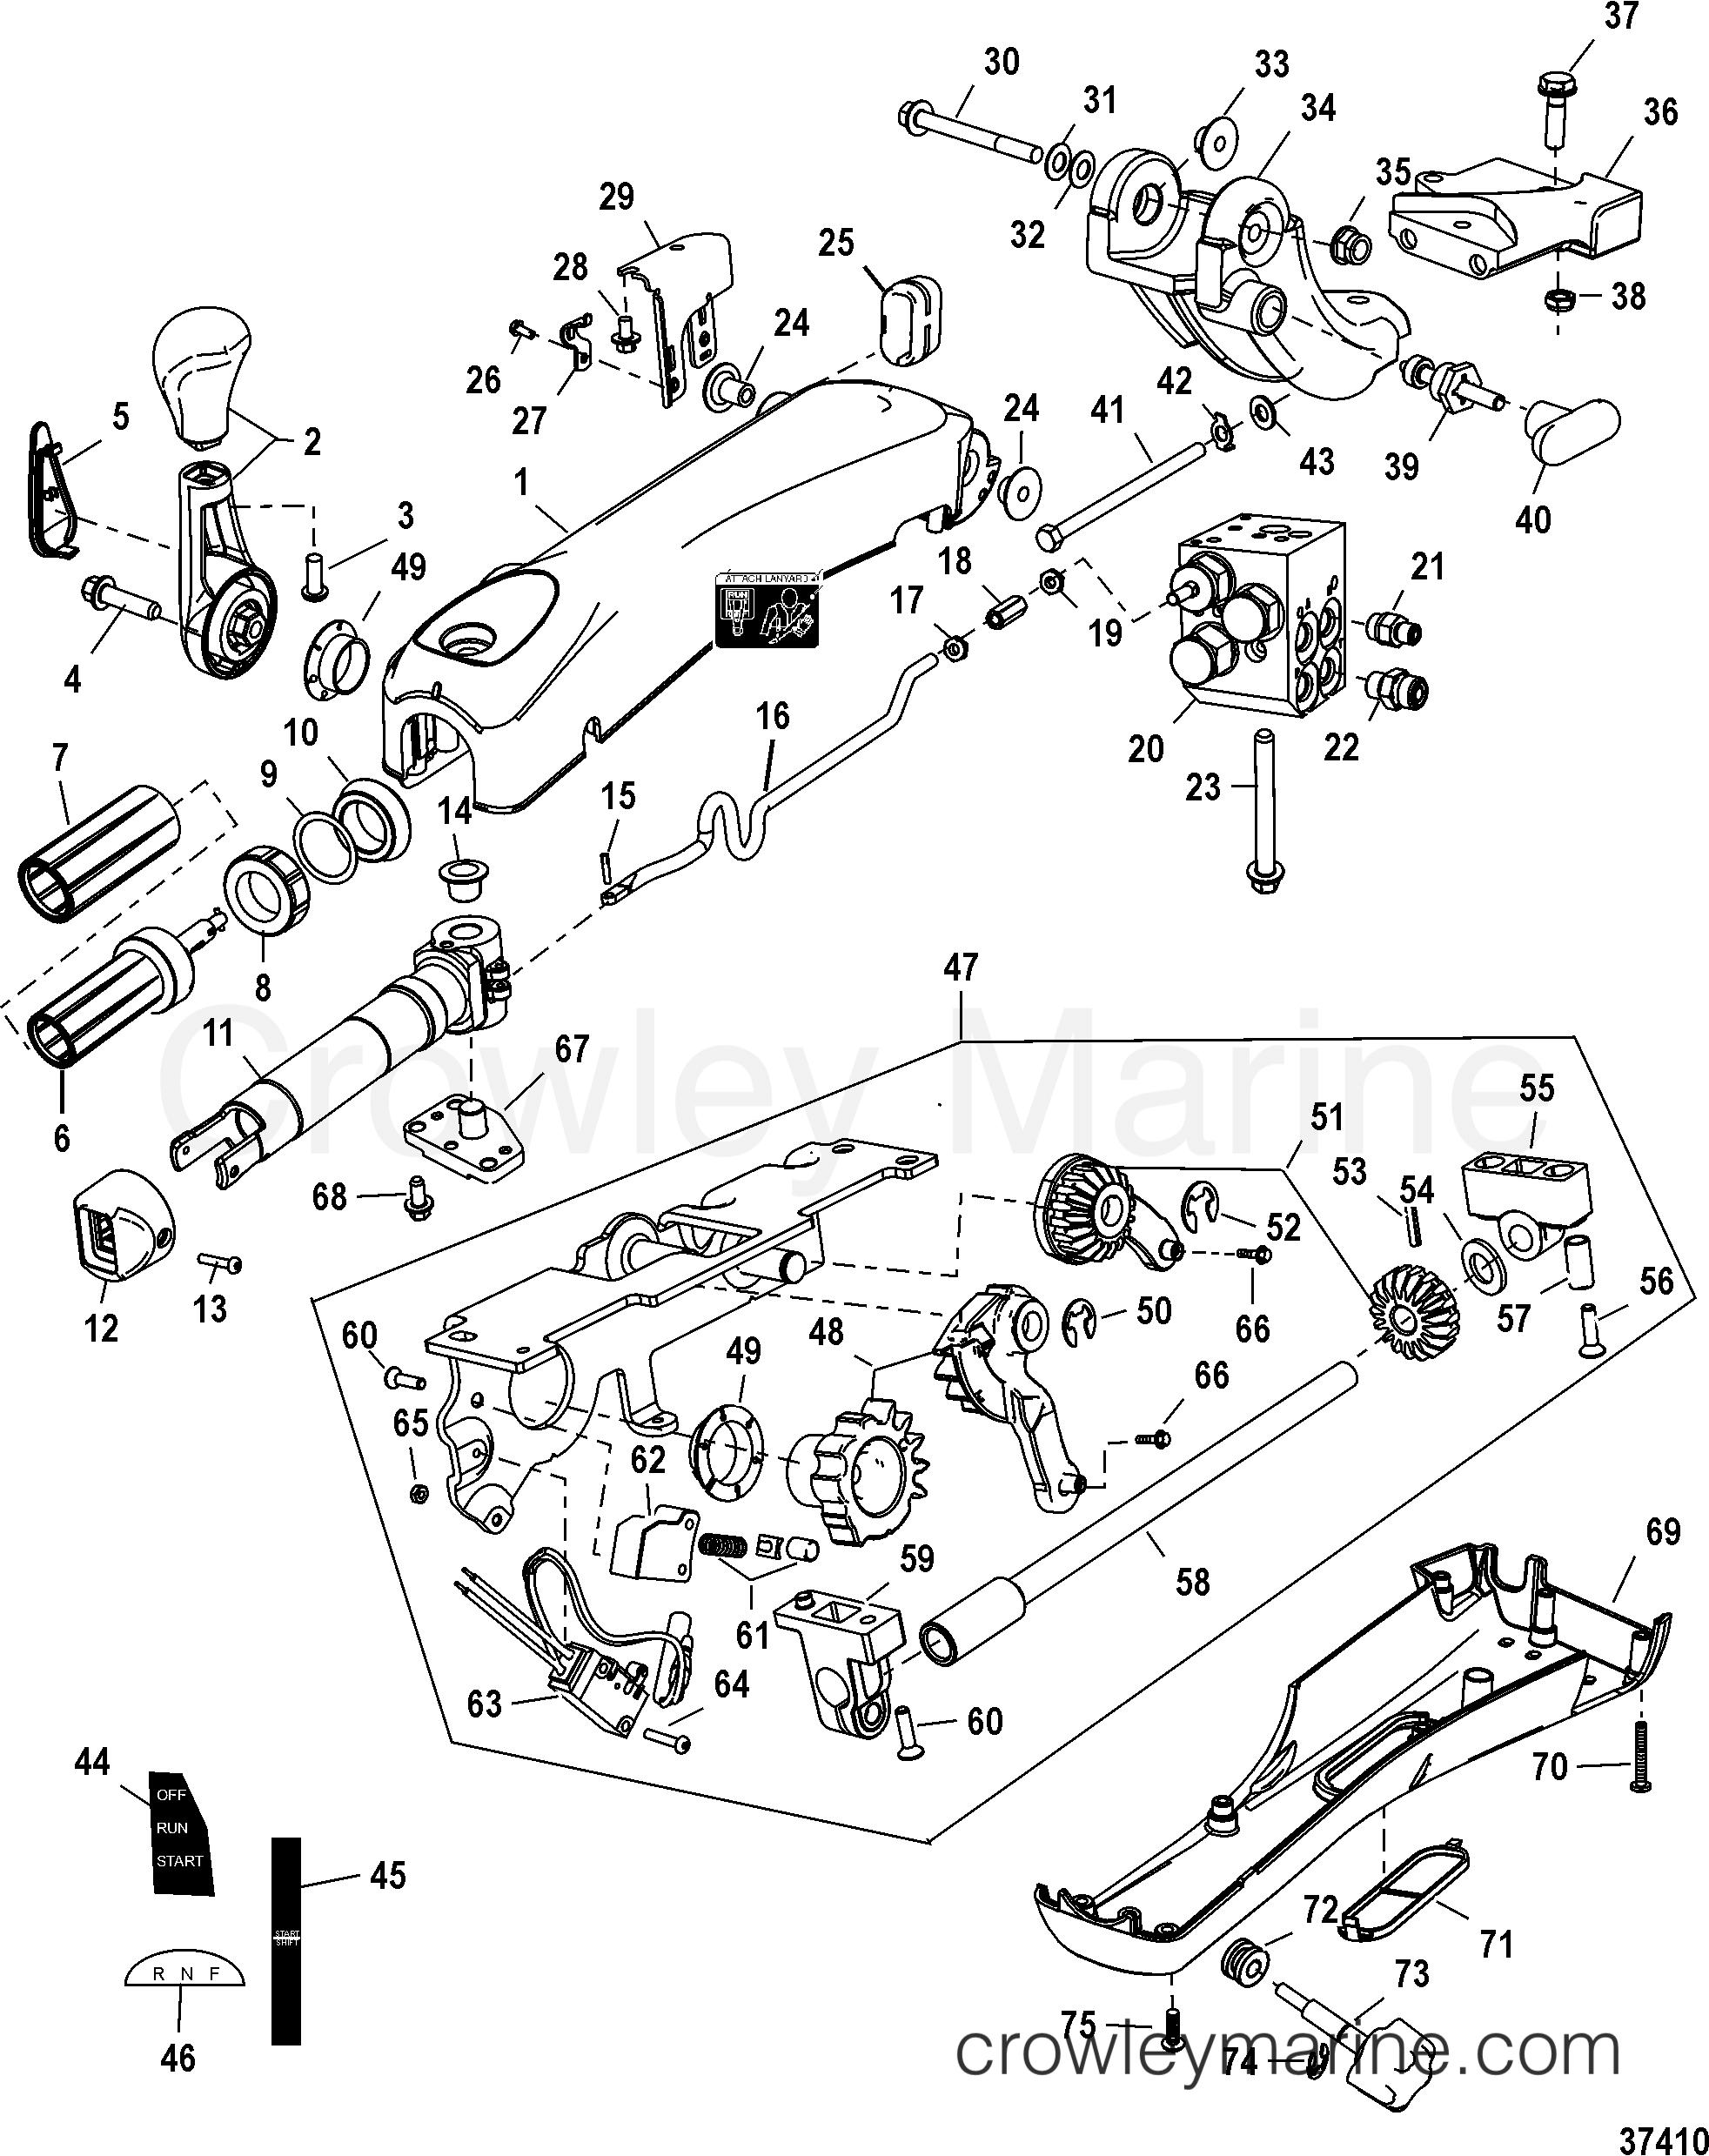 tiller handle kit big tiller-power steer  mechanical